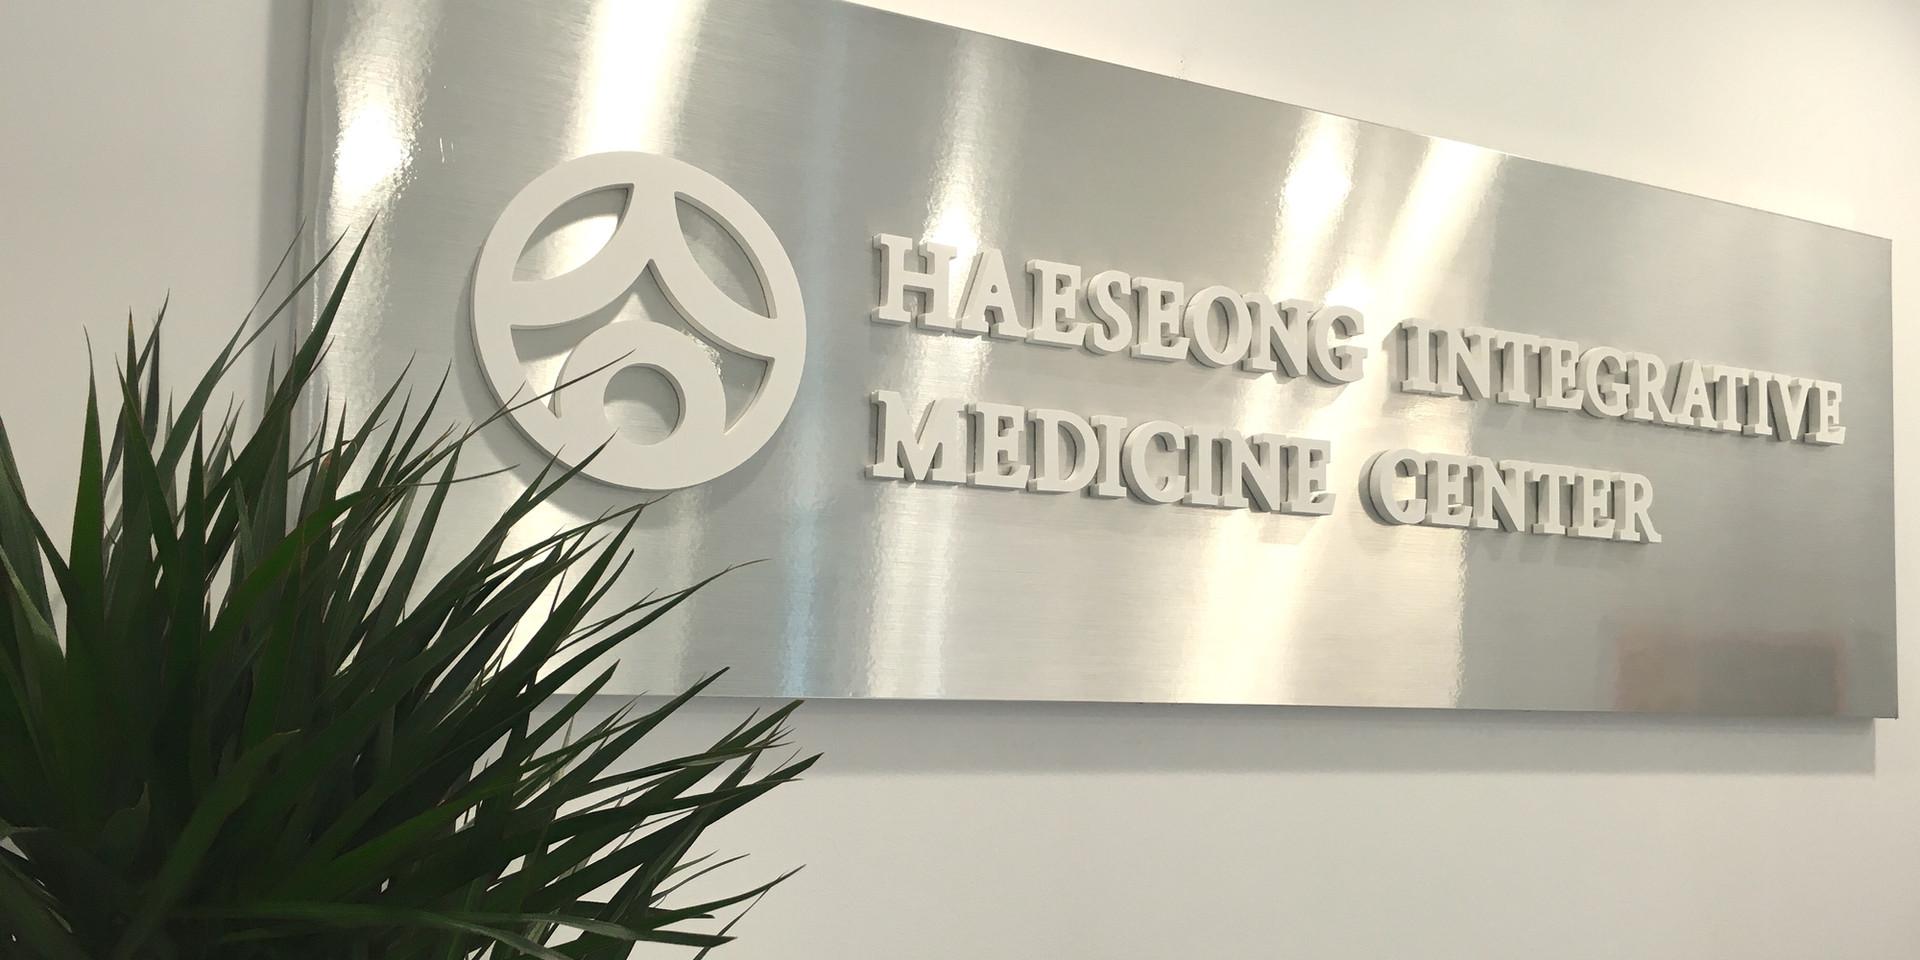 Haeseong Integrative Medicine Center Sign